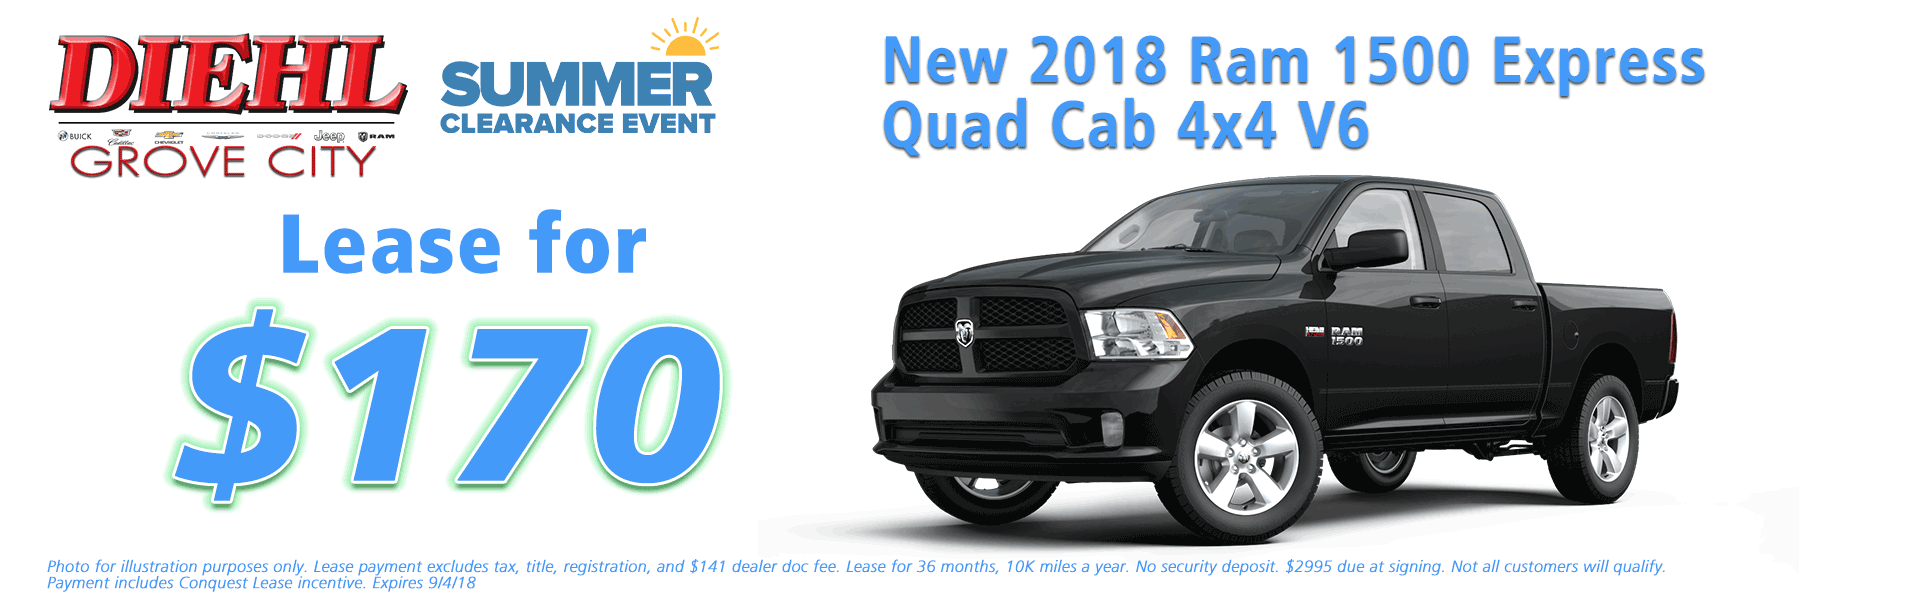 Diehl of Grove City, Grove City, PA 16127 Chrysler Jeep Dodge Ram Chevrolet Buick Cadillac NEW 2018 RAM 1500 EXPRESS QUAD CAB 4X4 6'4